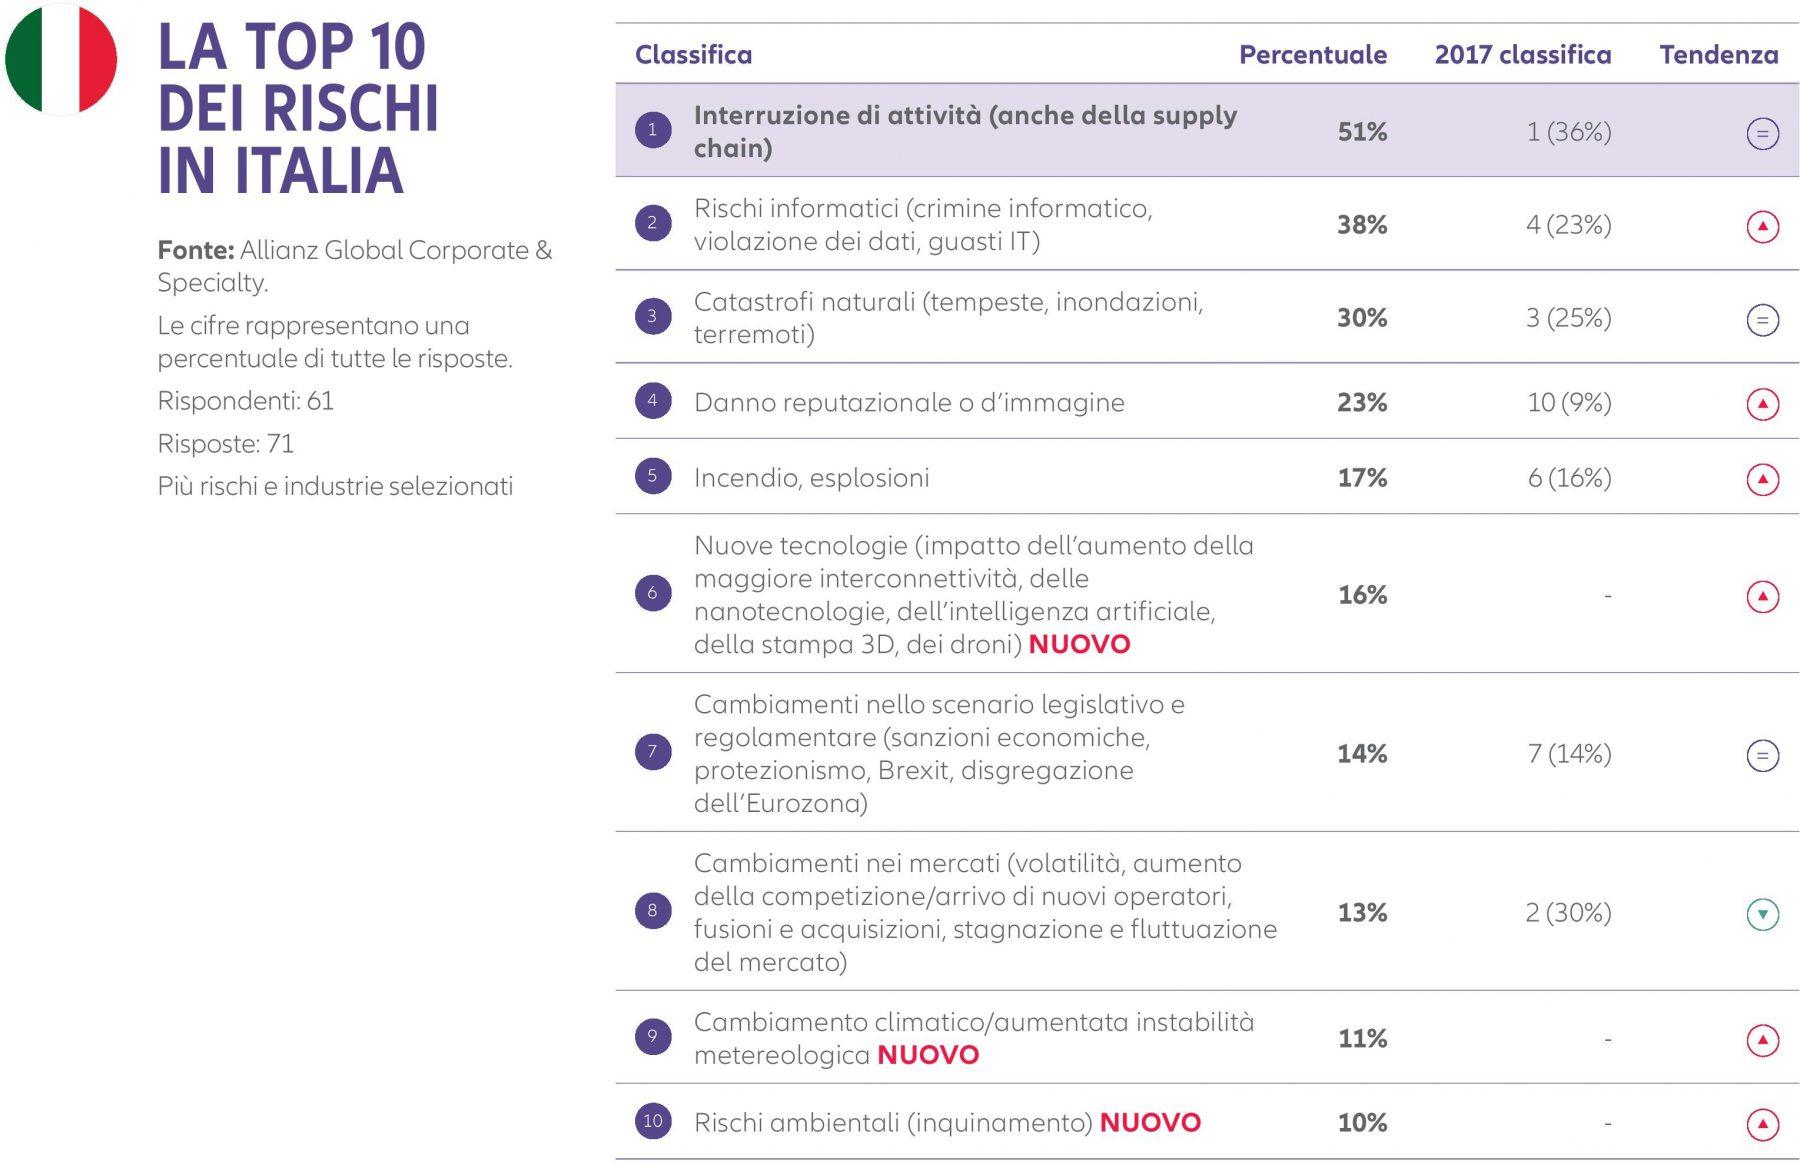 Allianz Risk Barometer 2018 - Top 10 Rischi Italia Imc